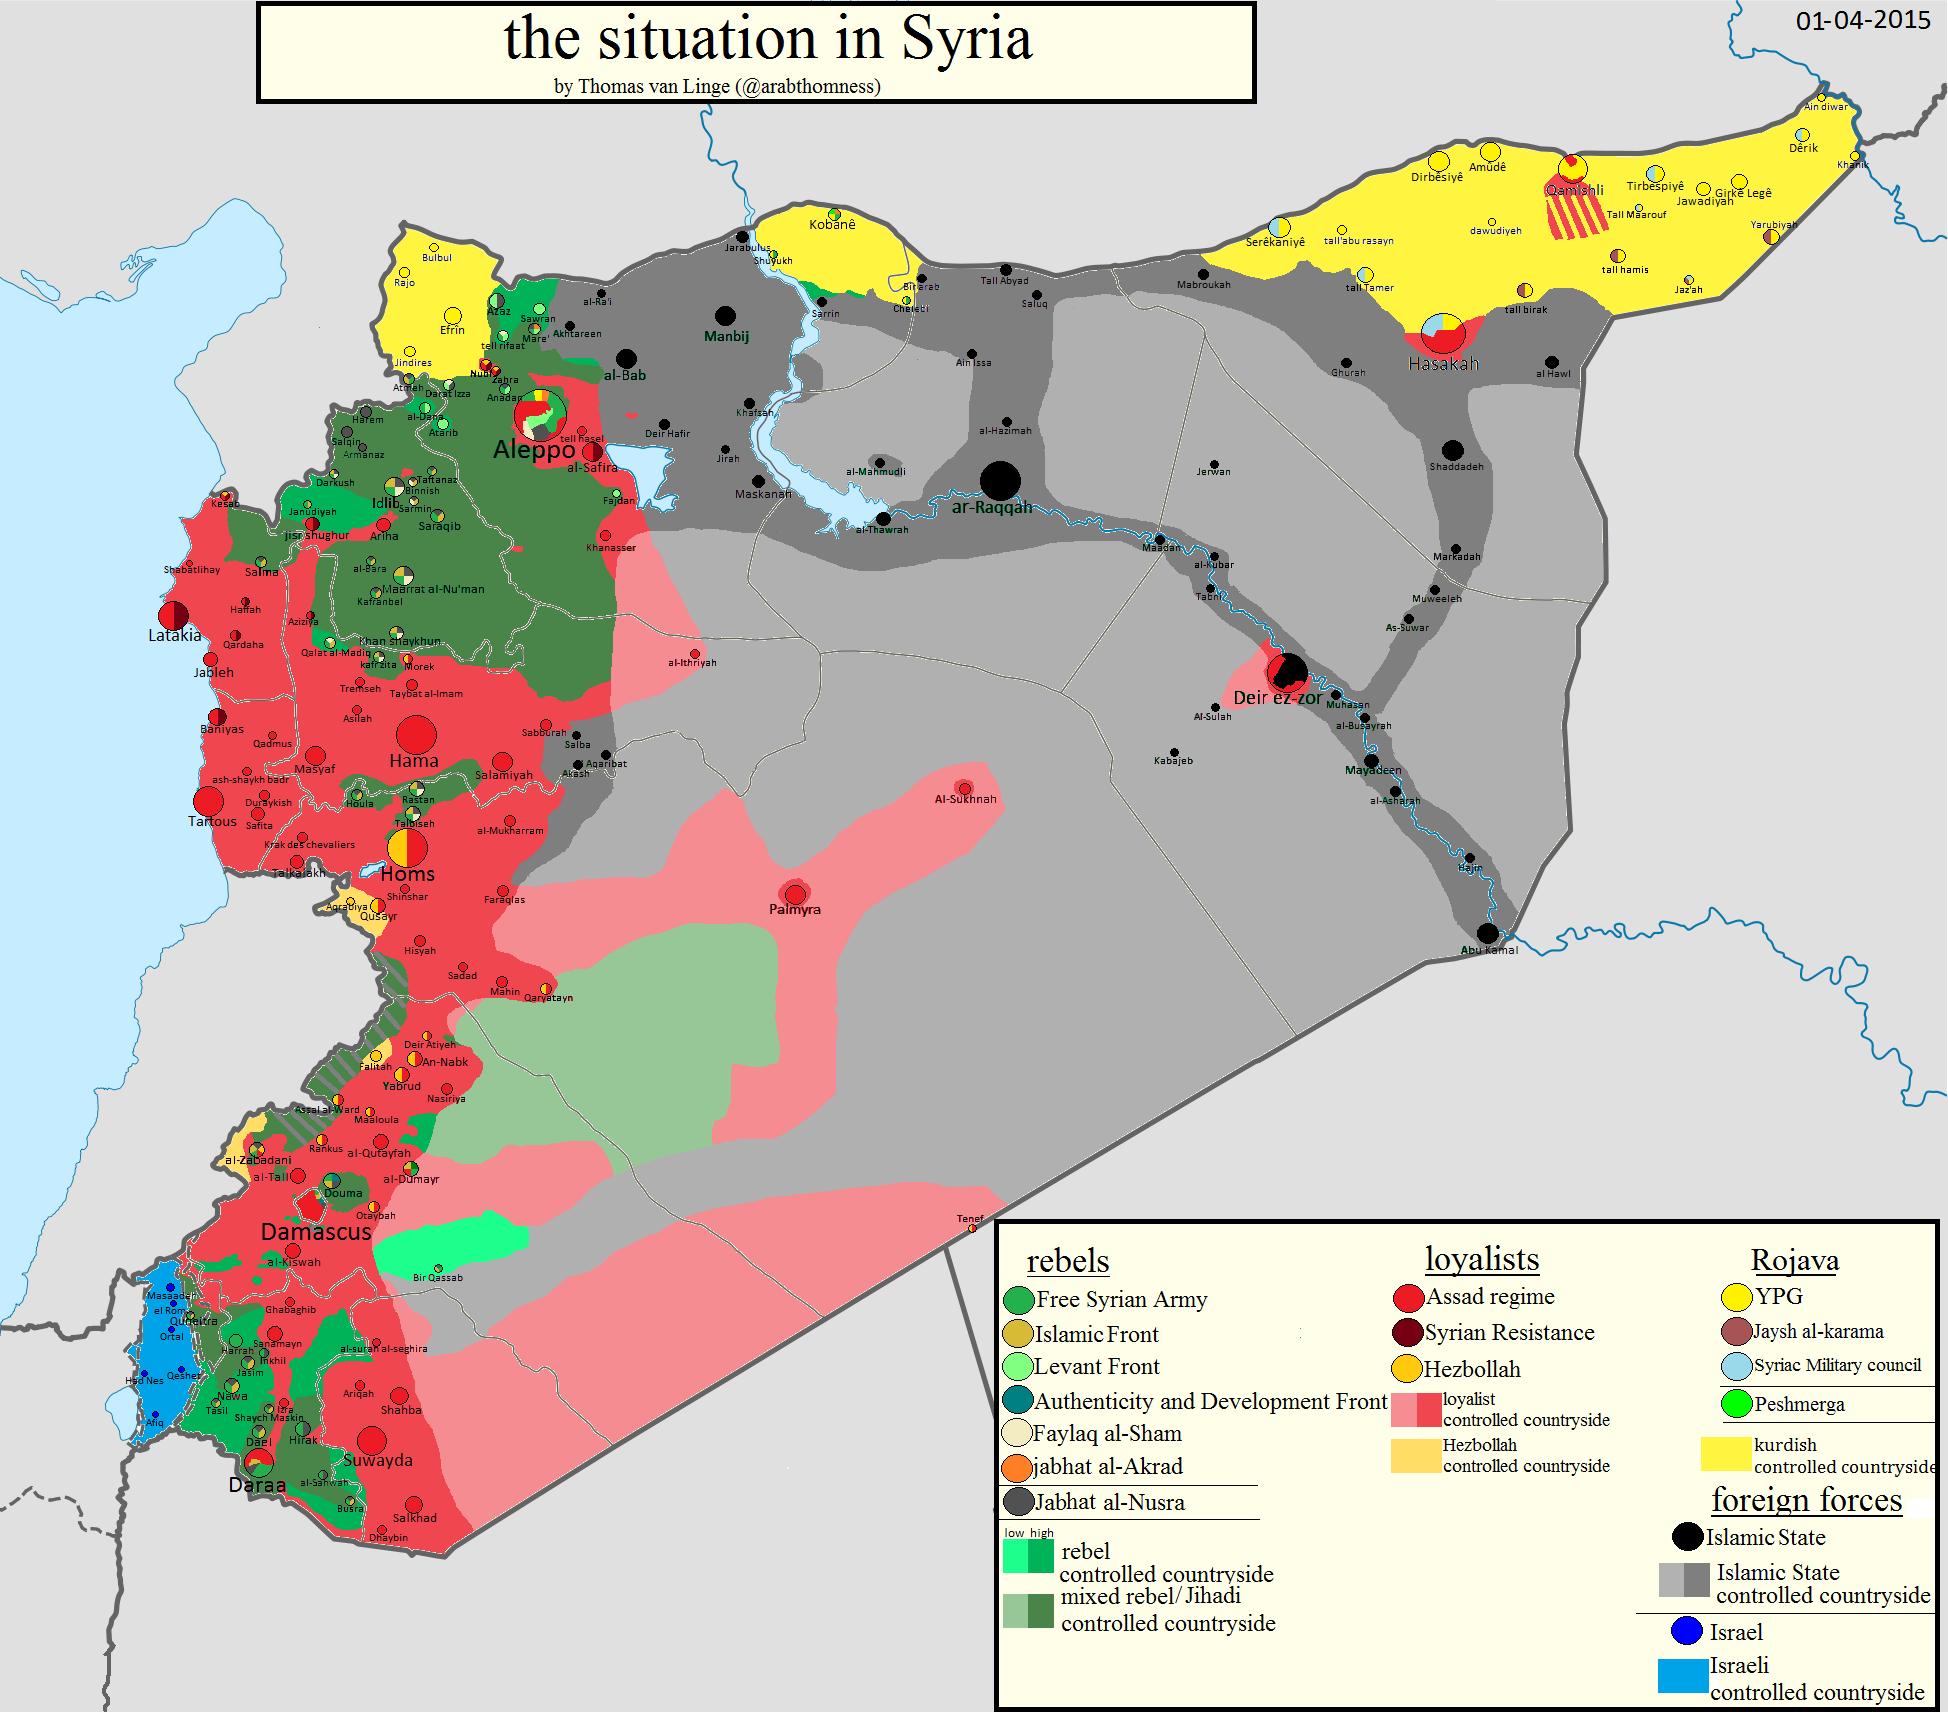 http://www.les-crises.fr/wp-content/uploads/2015/10/32-syrie-04-2015.png